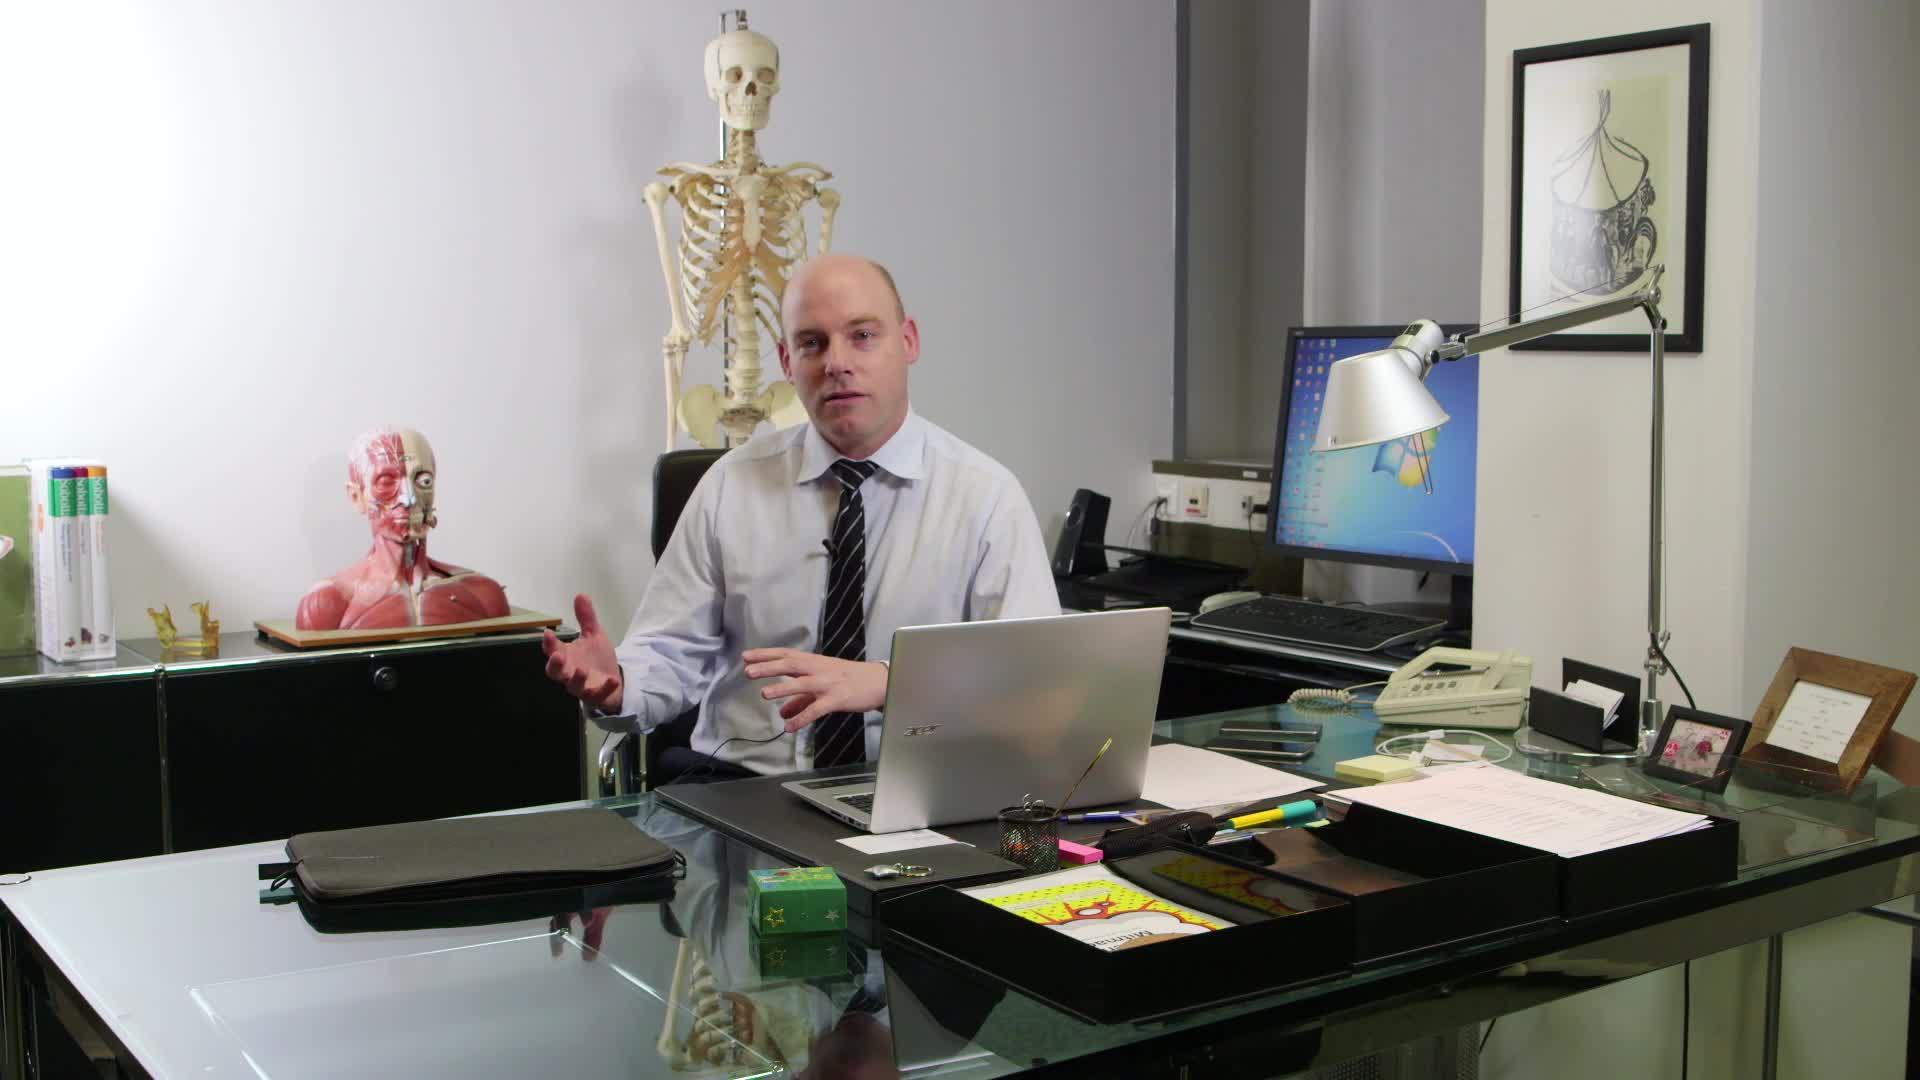 Prof. Dr. Dr. Marco Kesting - Ich forsche, lehre und operiere preview image